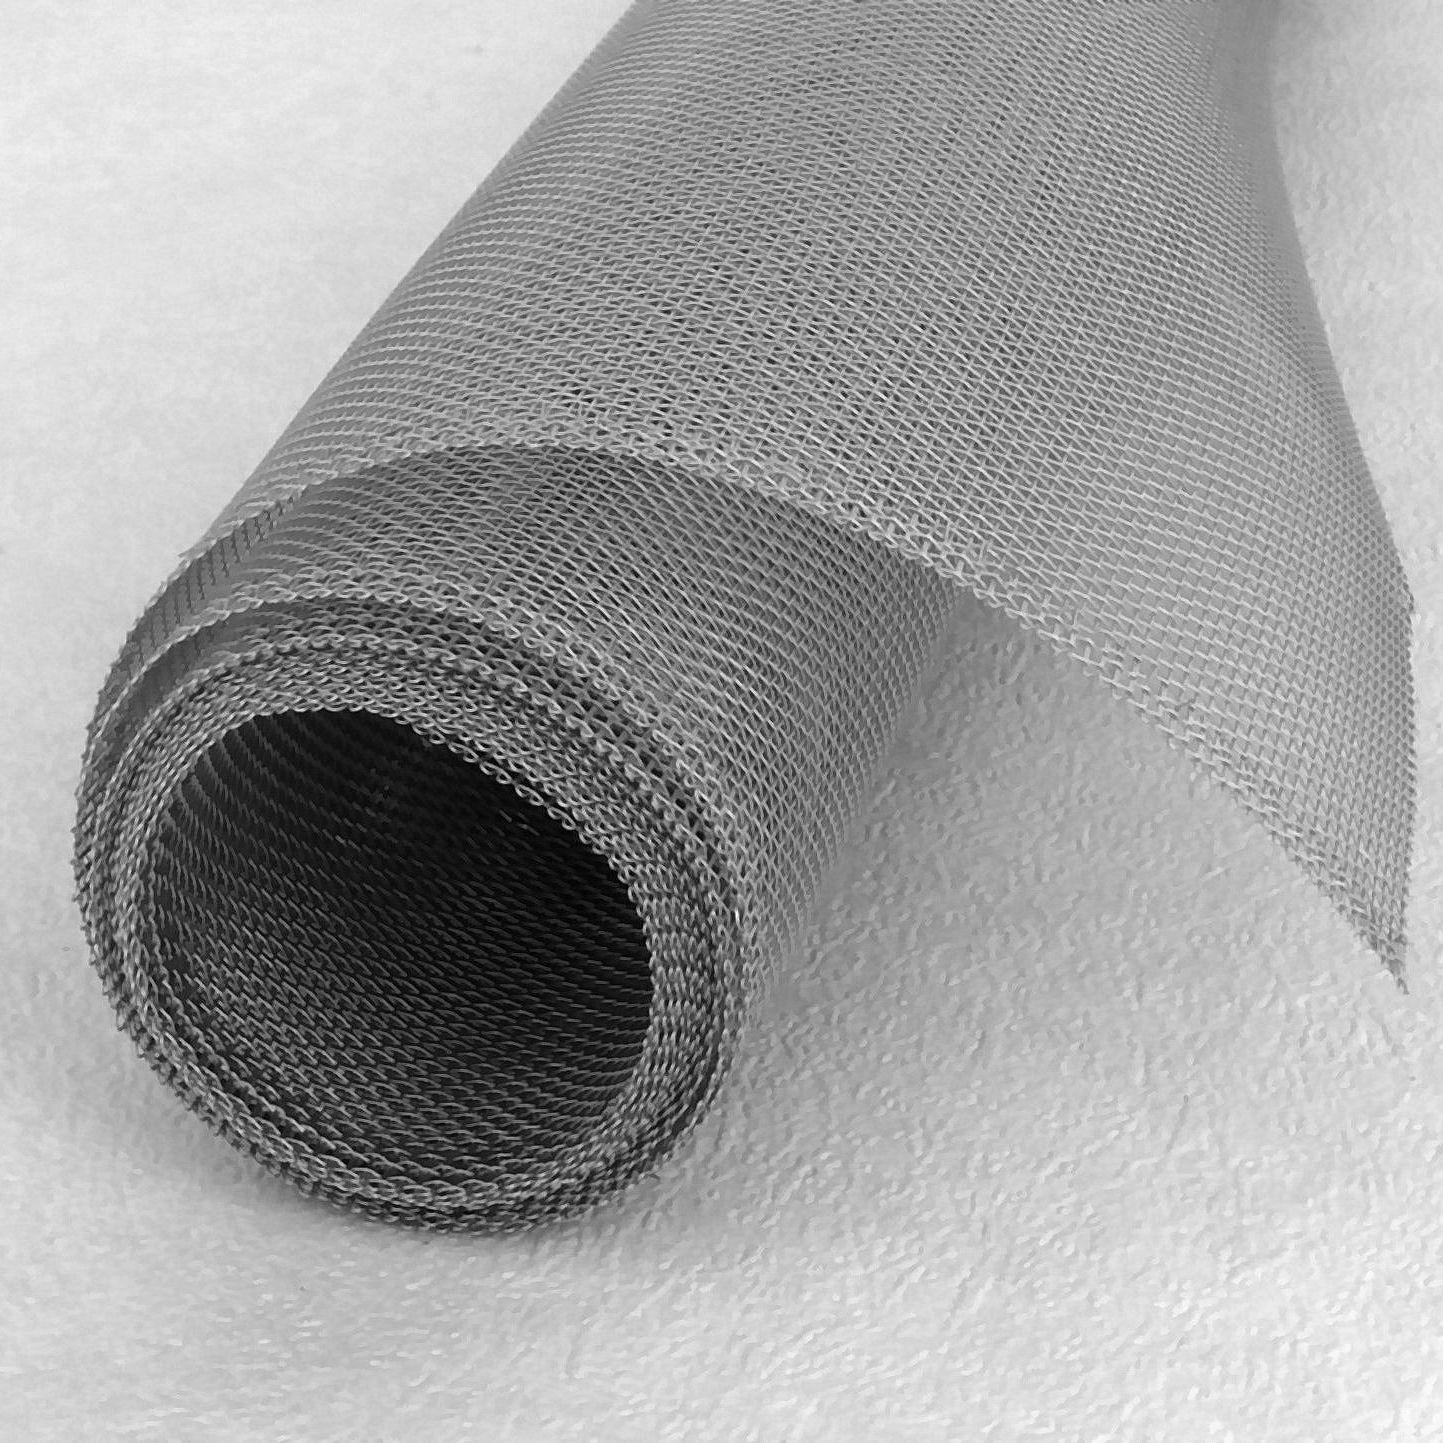 Aluminiumgewebe für Insektenschutz, Modellbau uvm.